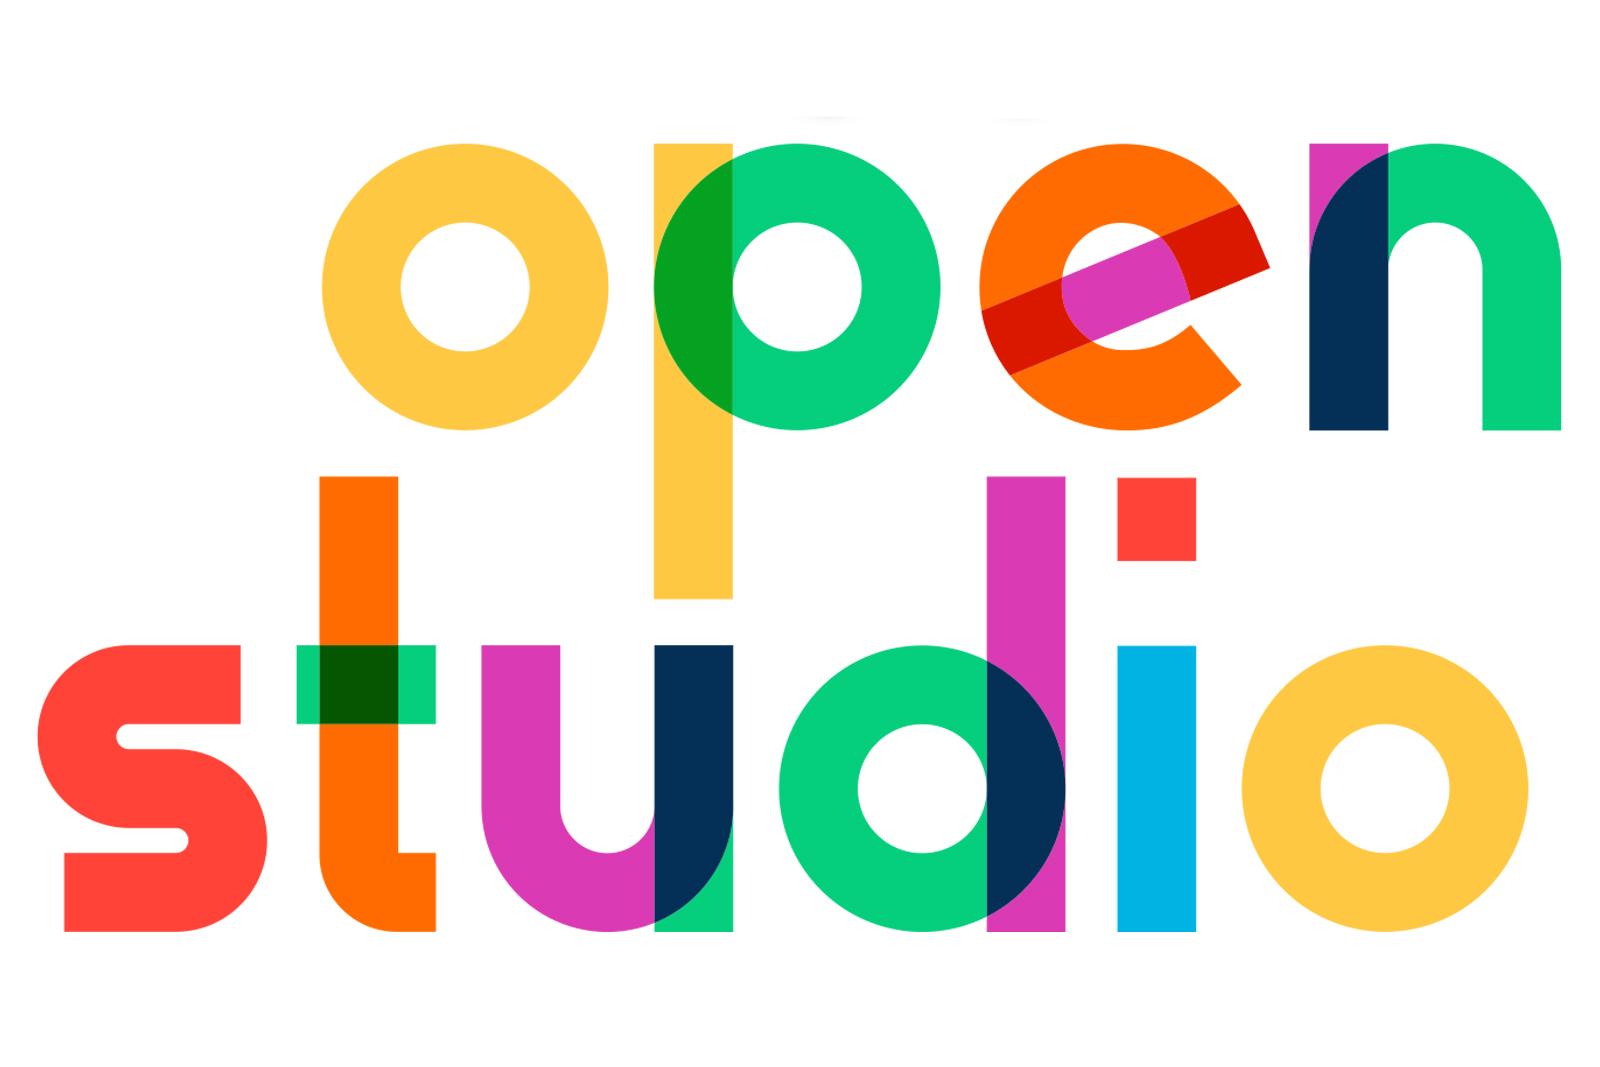 Multicolor words 22open studio22 on white background